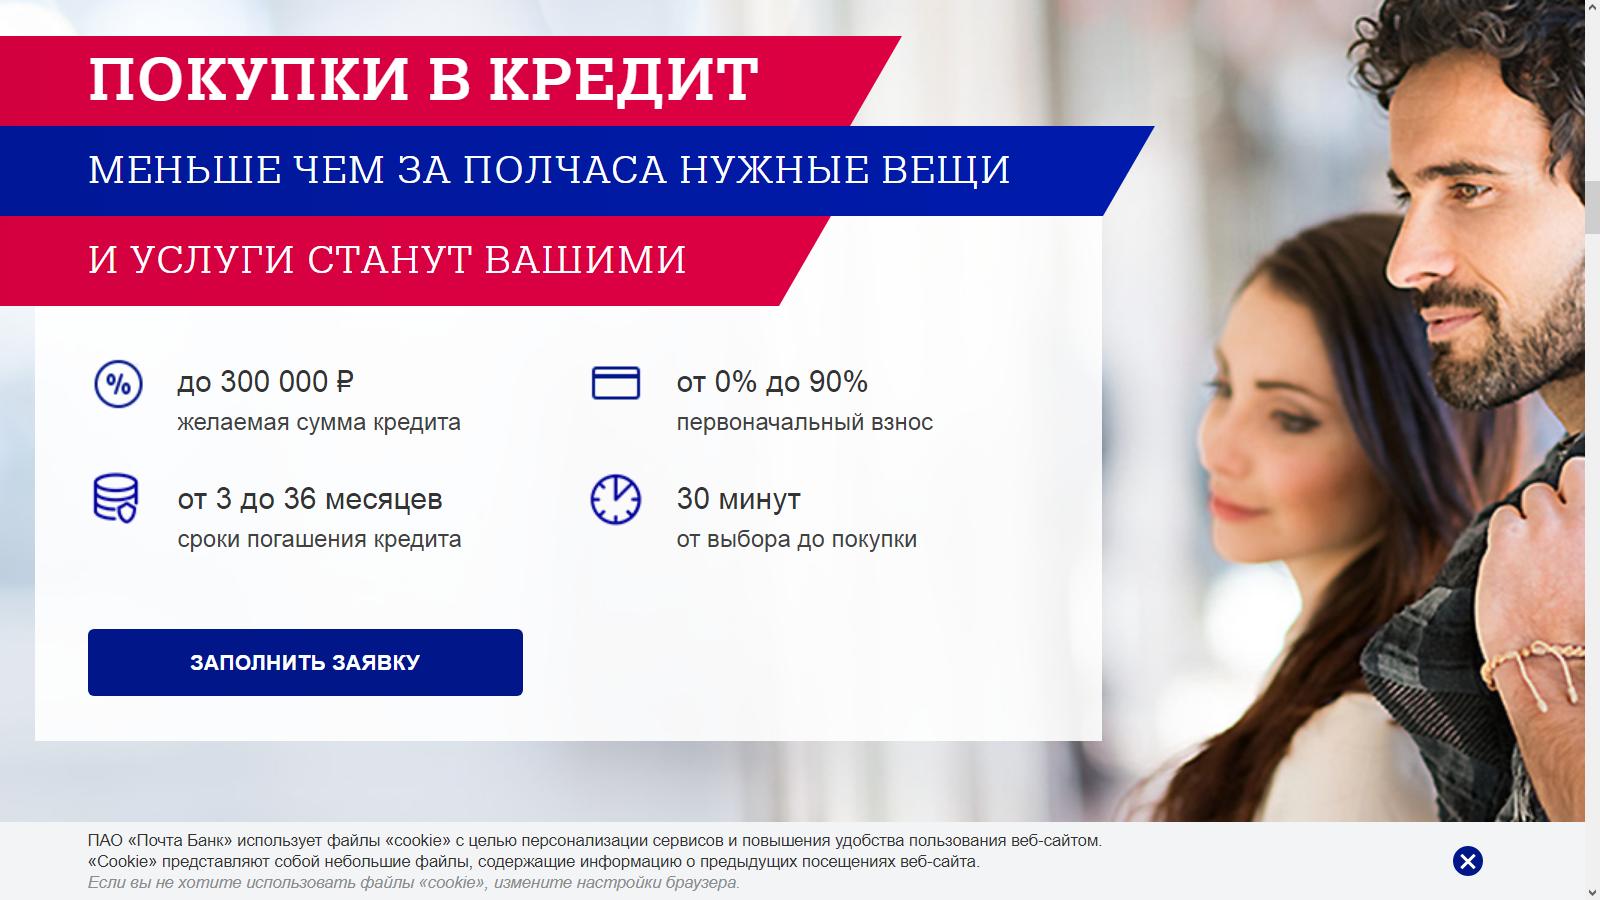 оставить заявку на кредитную карту тинькофф банк